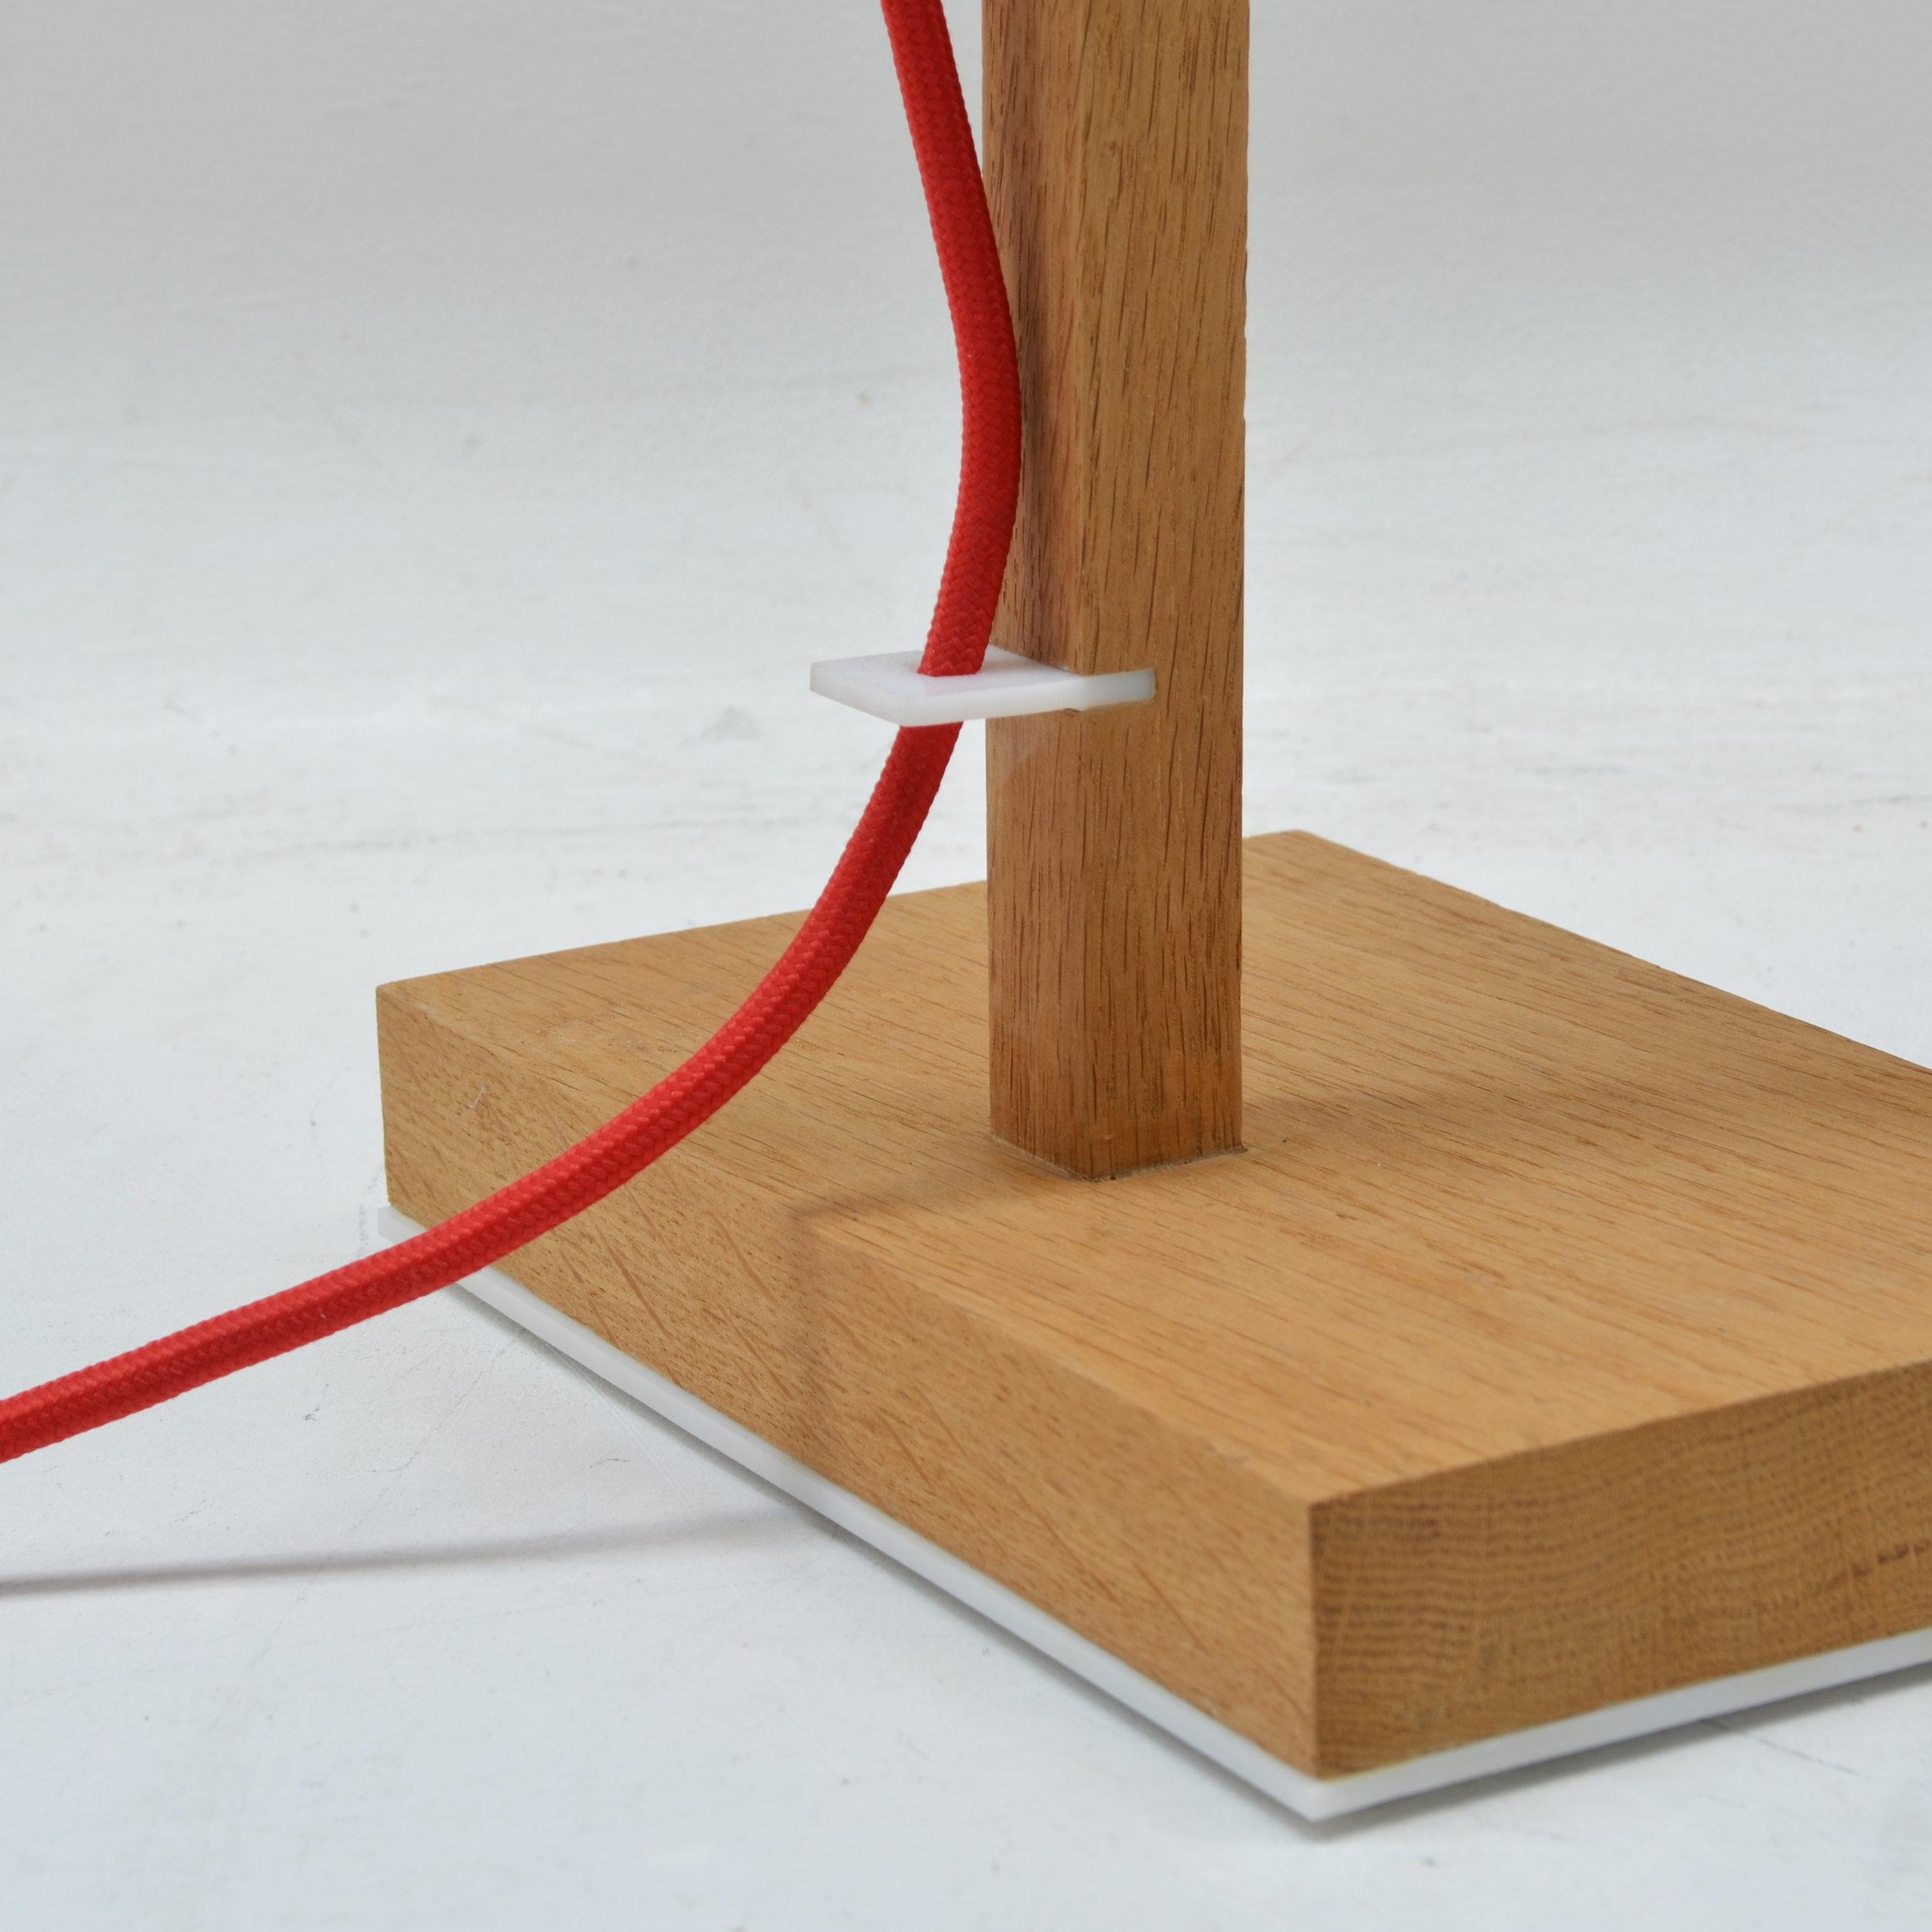 lamp-detail-1.jpg